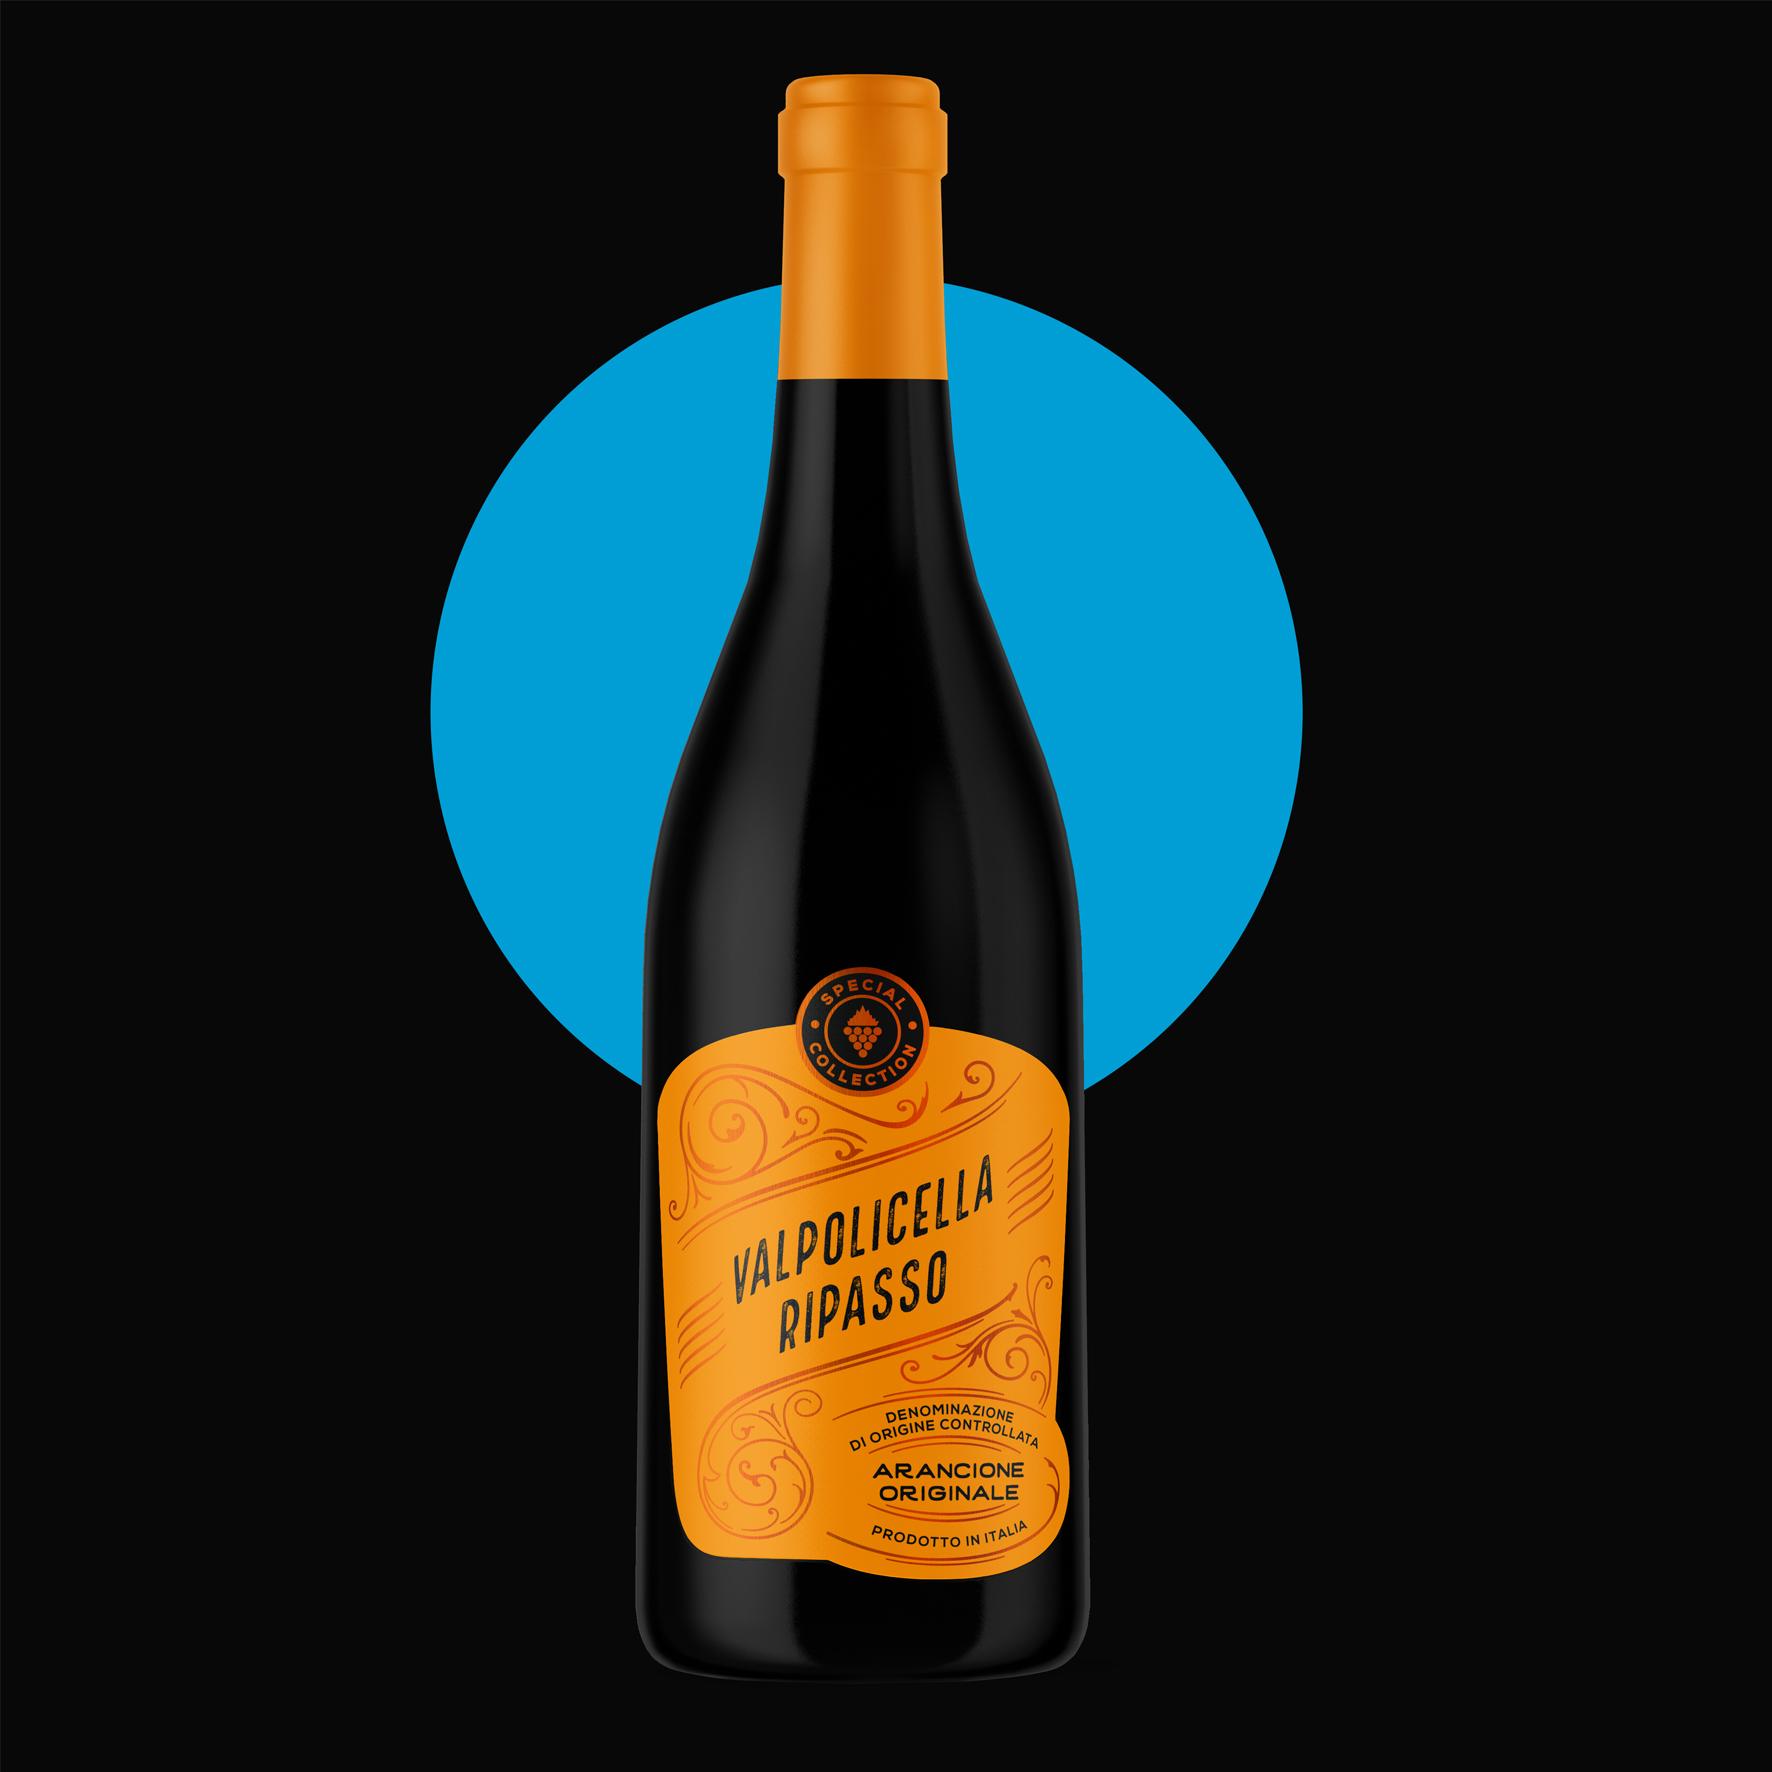 Arancione Originale Wine Labels Designed by DesignCompany